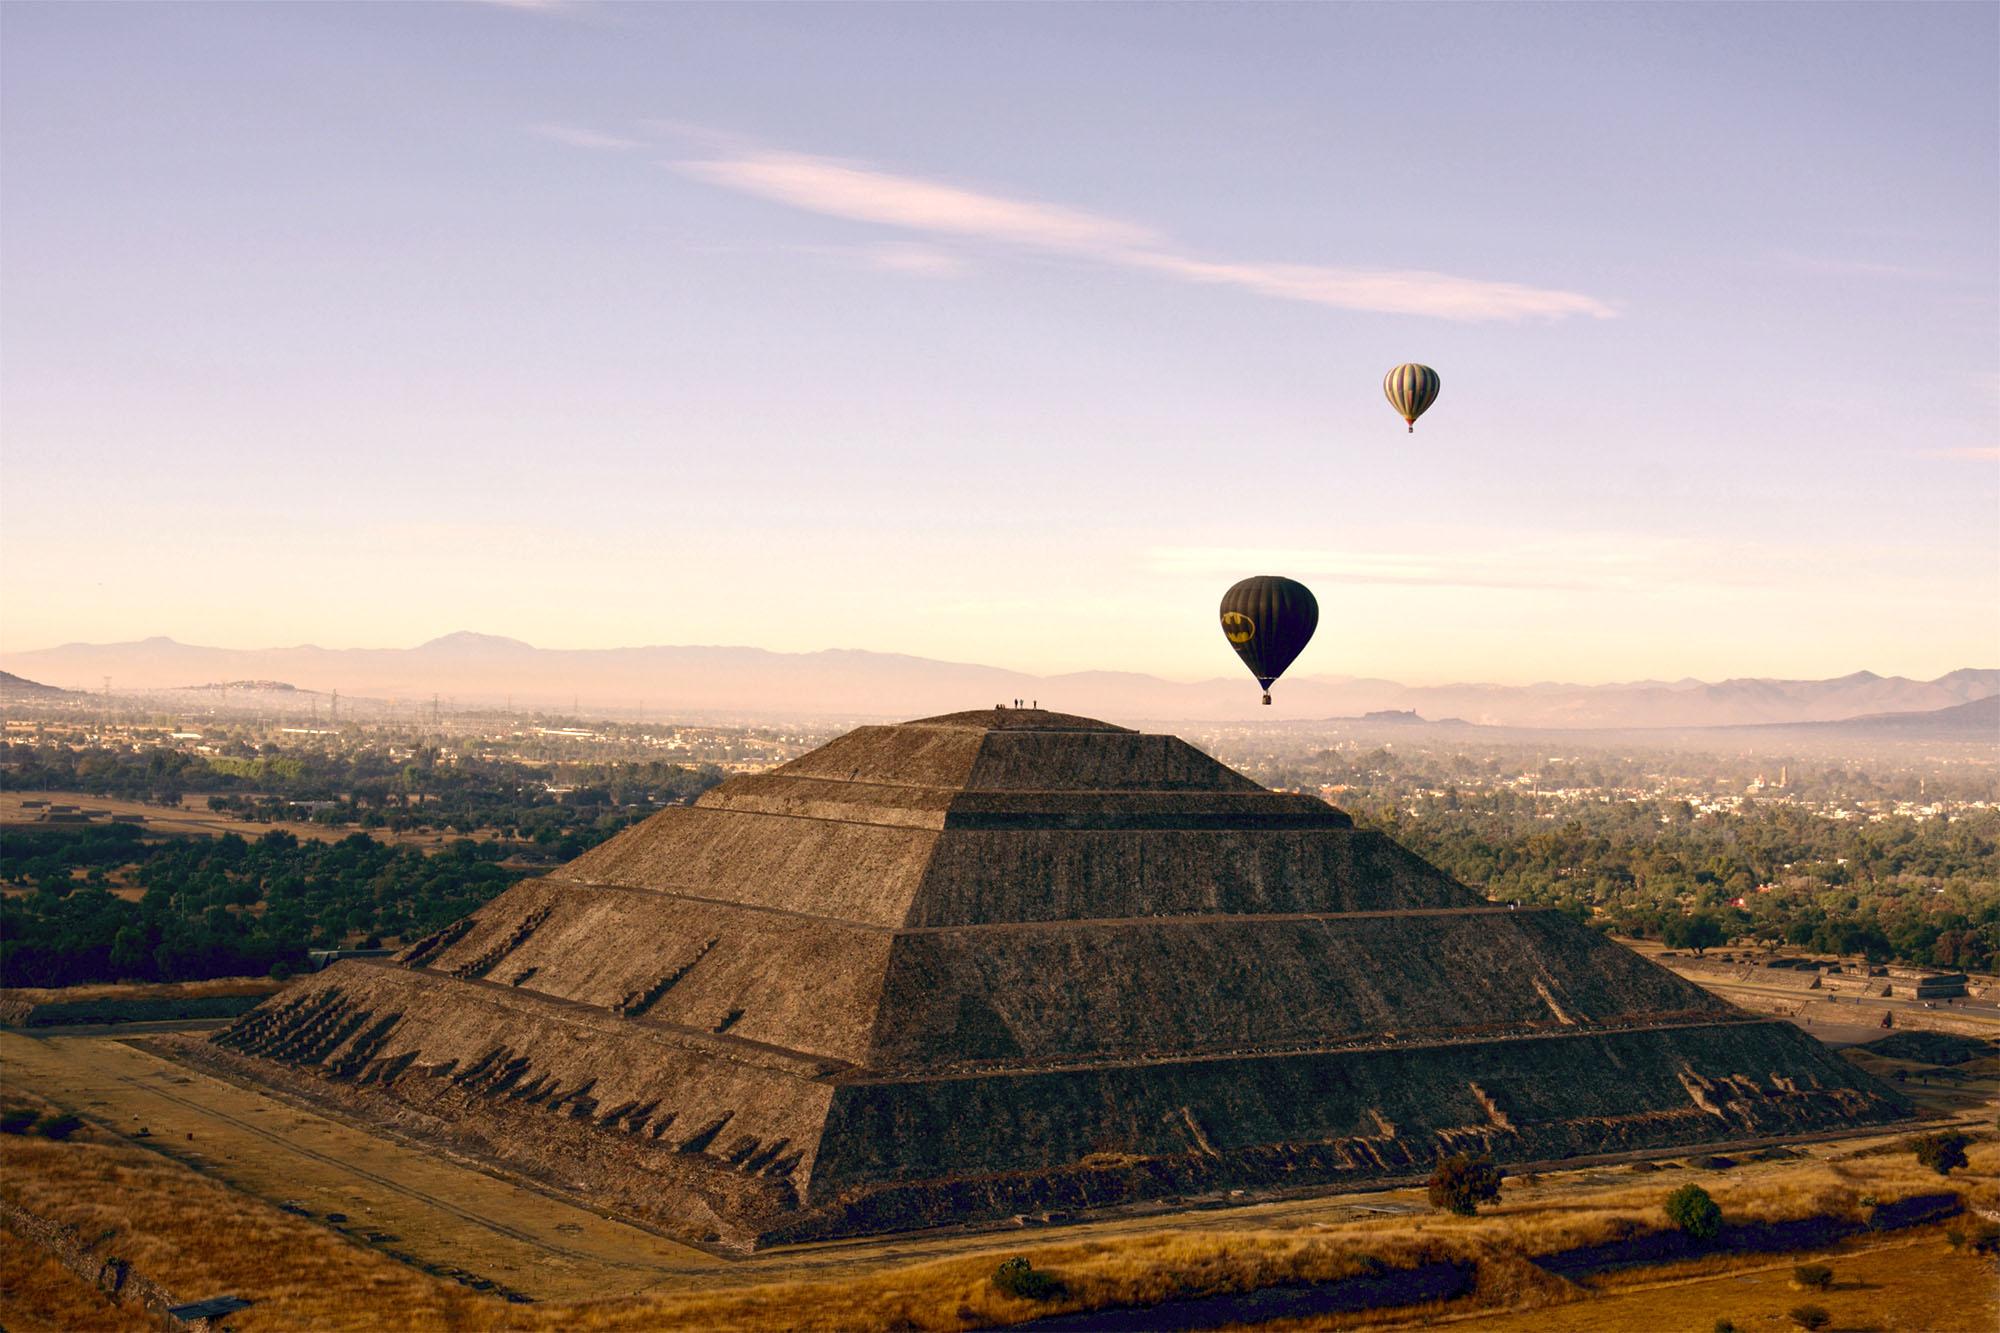 Teotihuacan per luchtballon